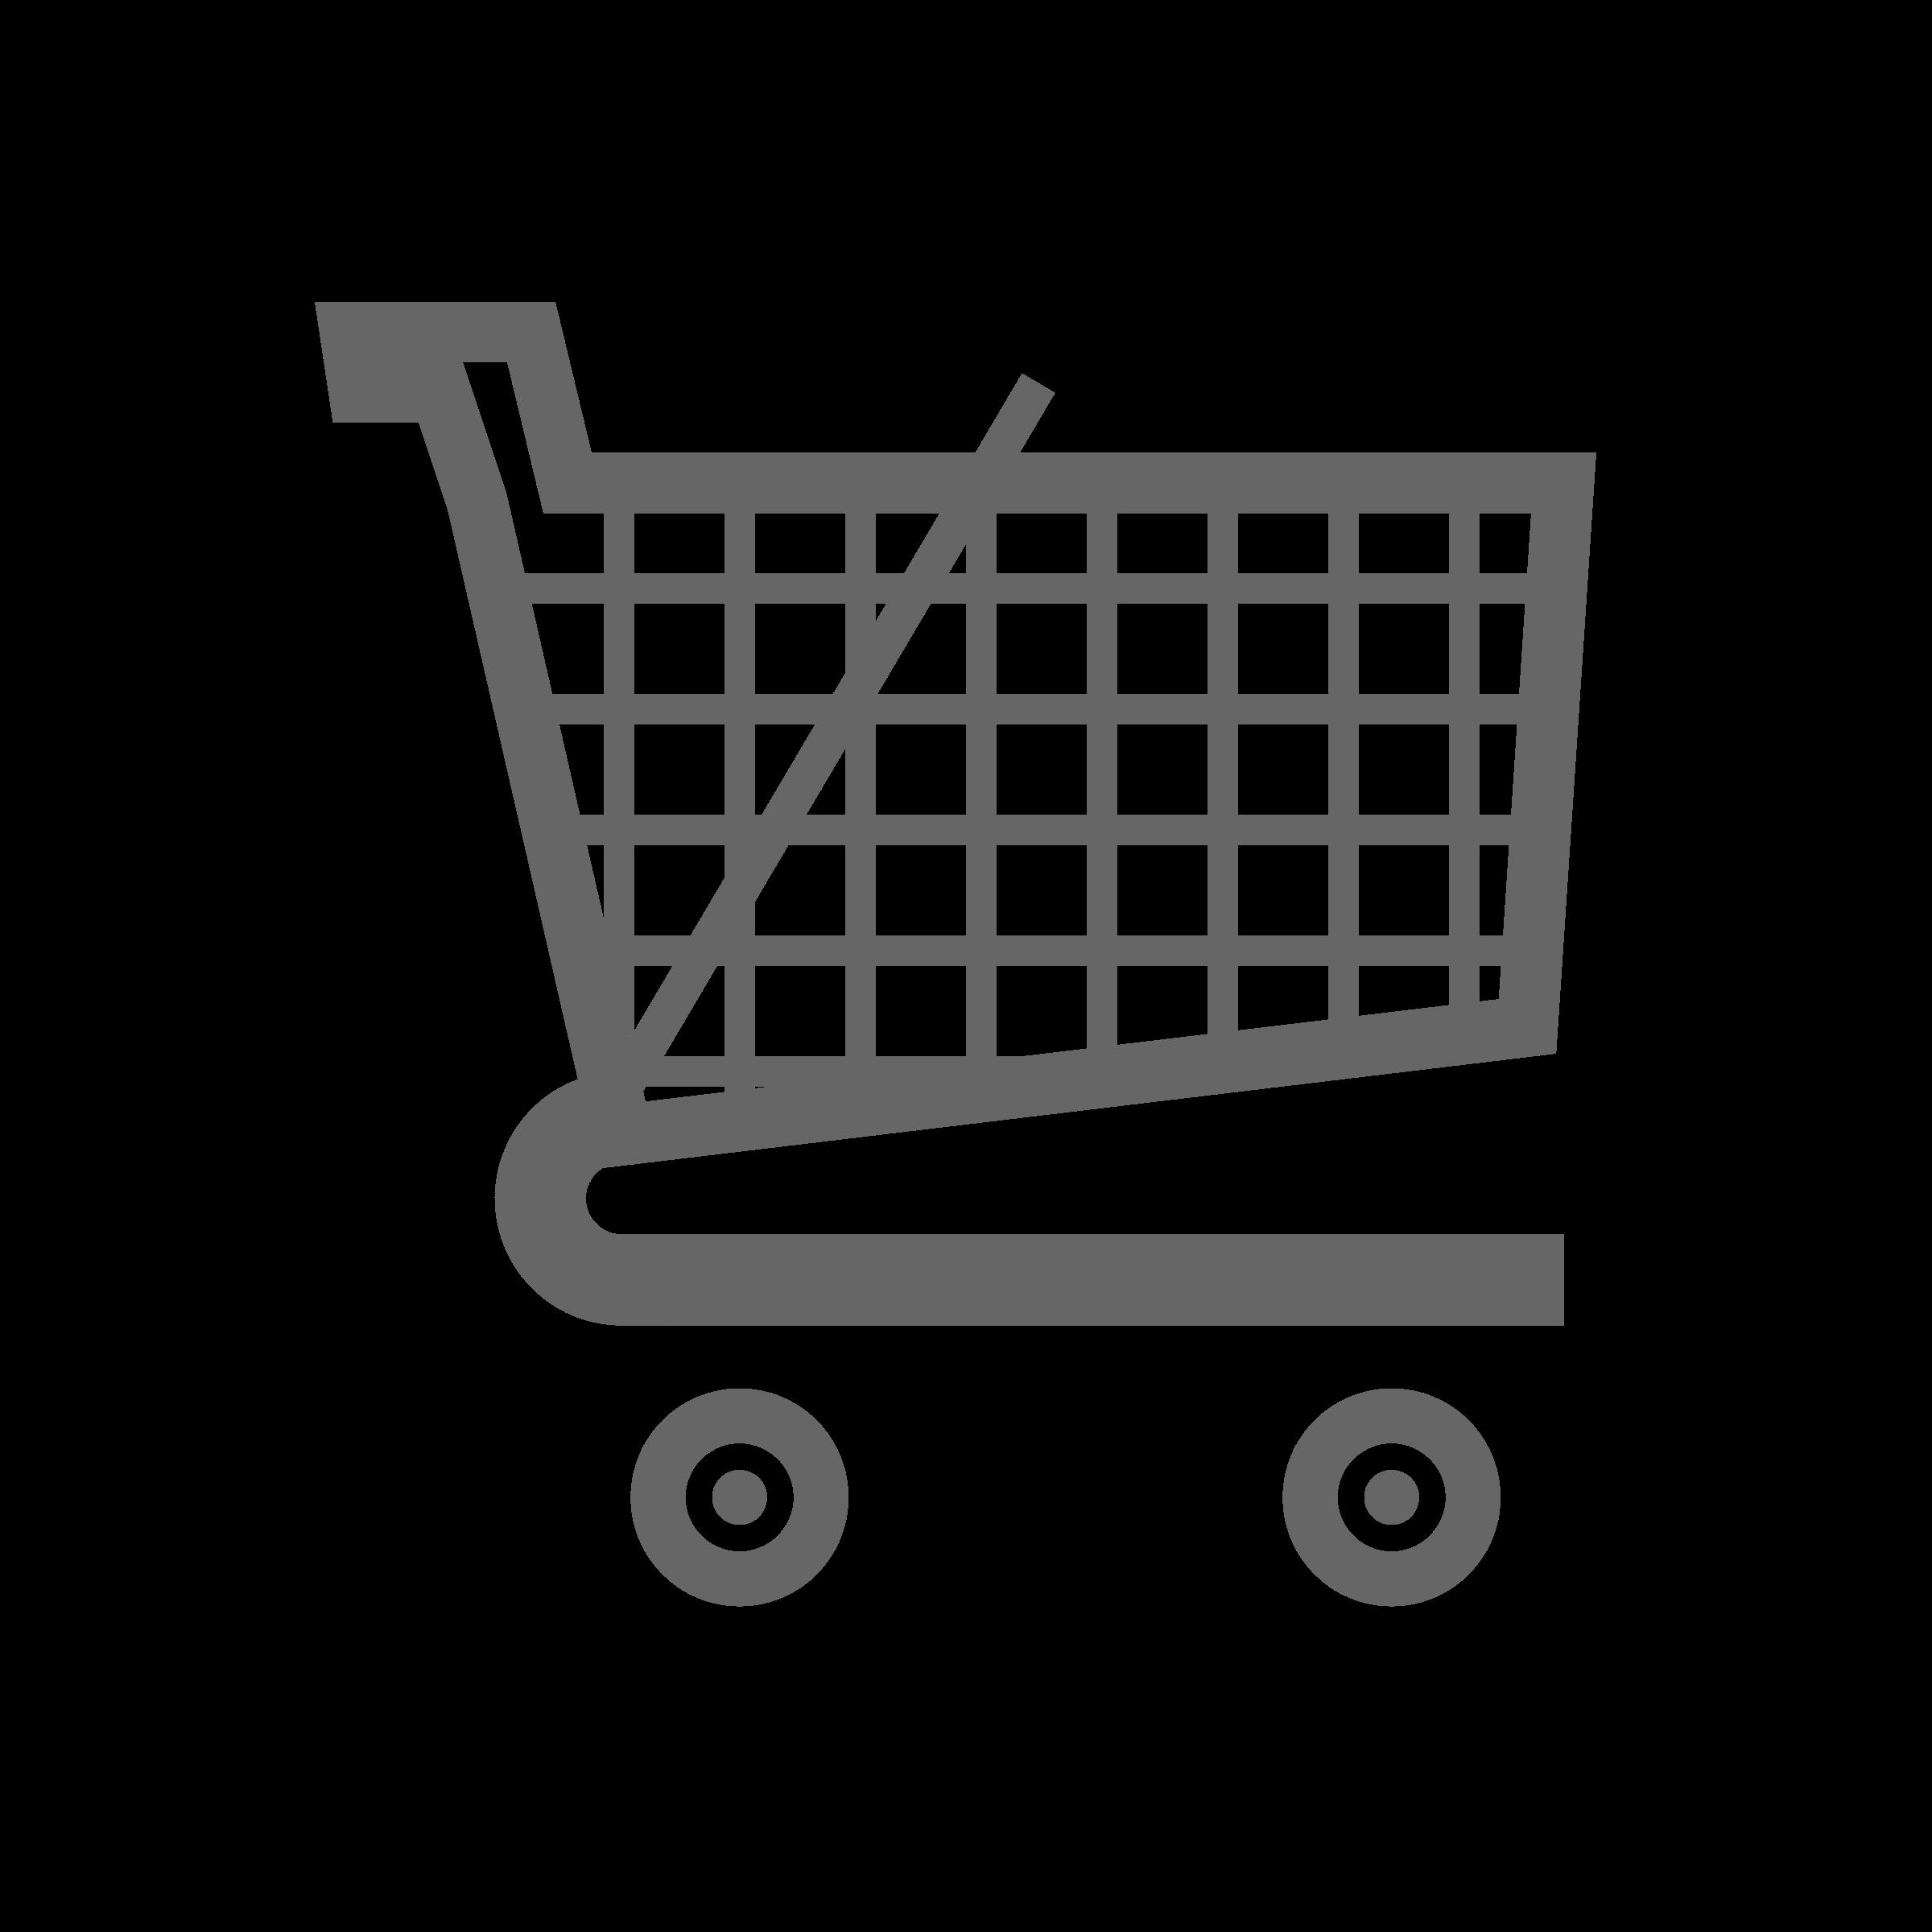 Cart clipart trolly Clipart small Cart small Cart